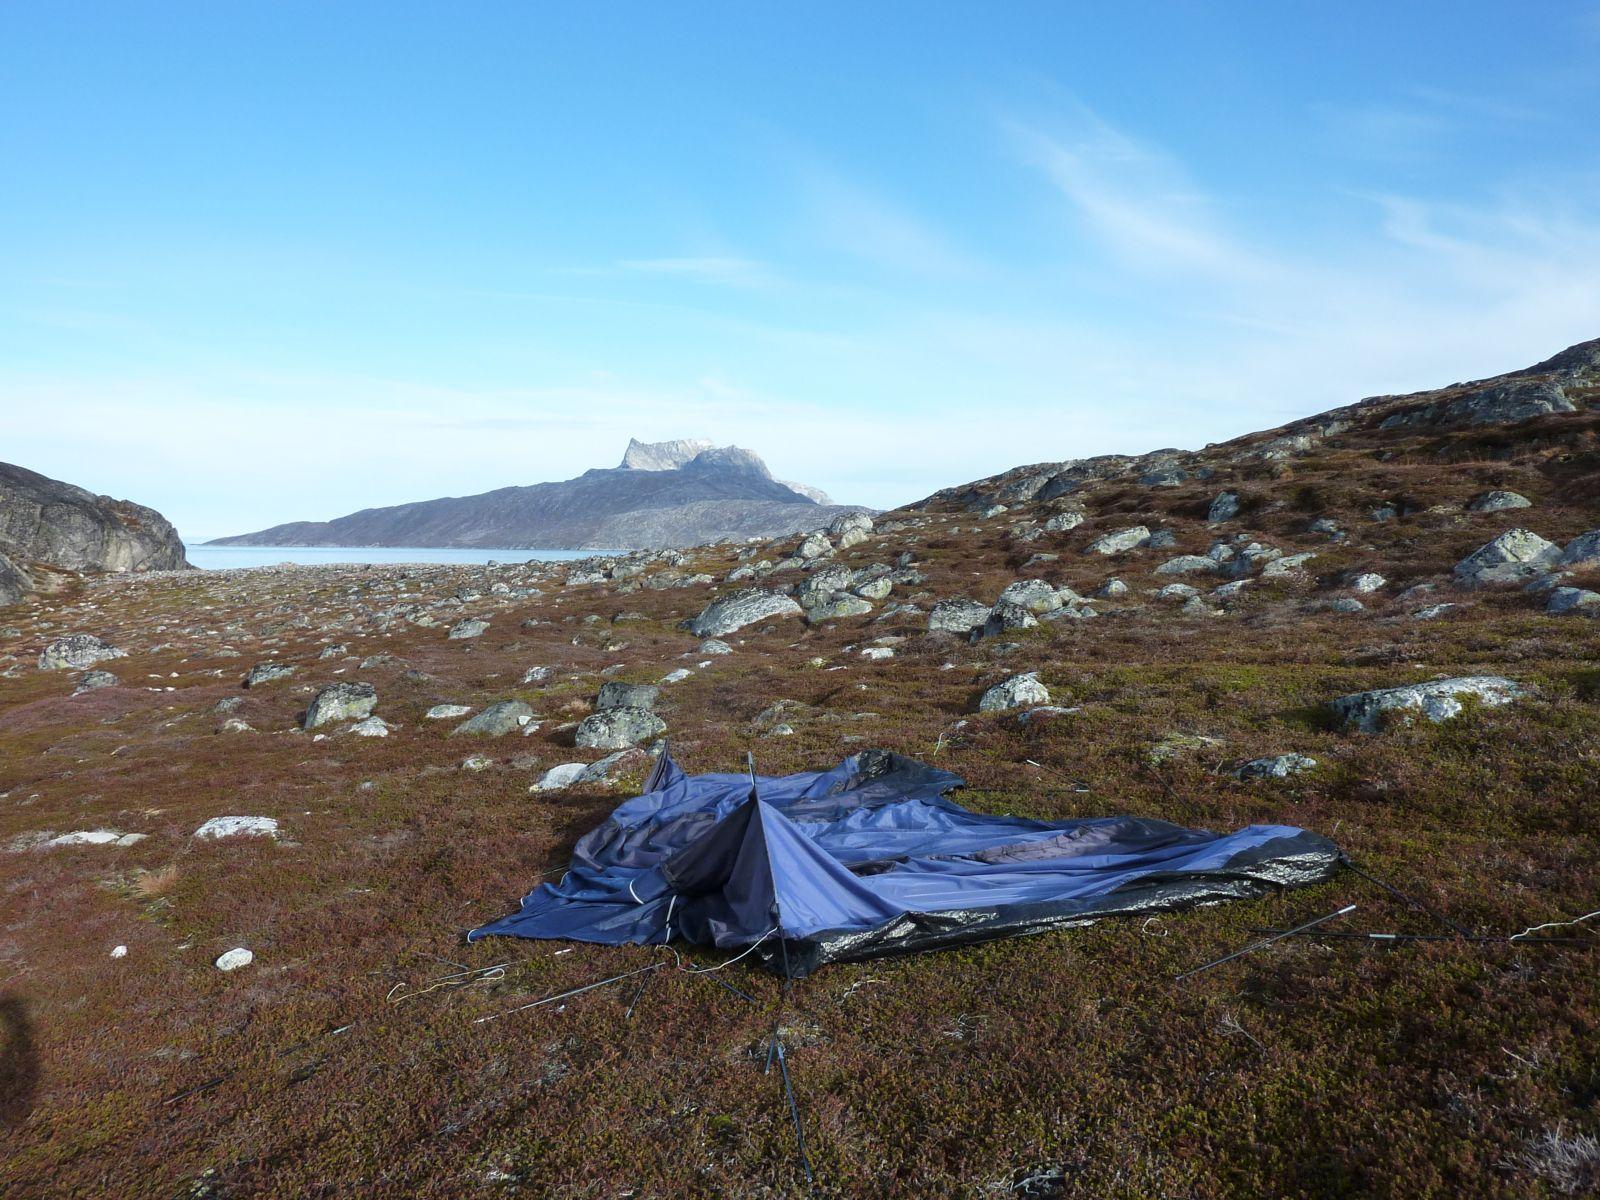 2010-10-12-1351_-_Affald; Sermitsiaq